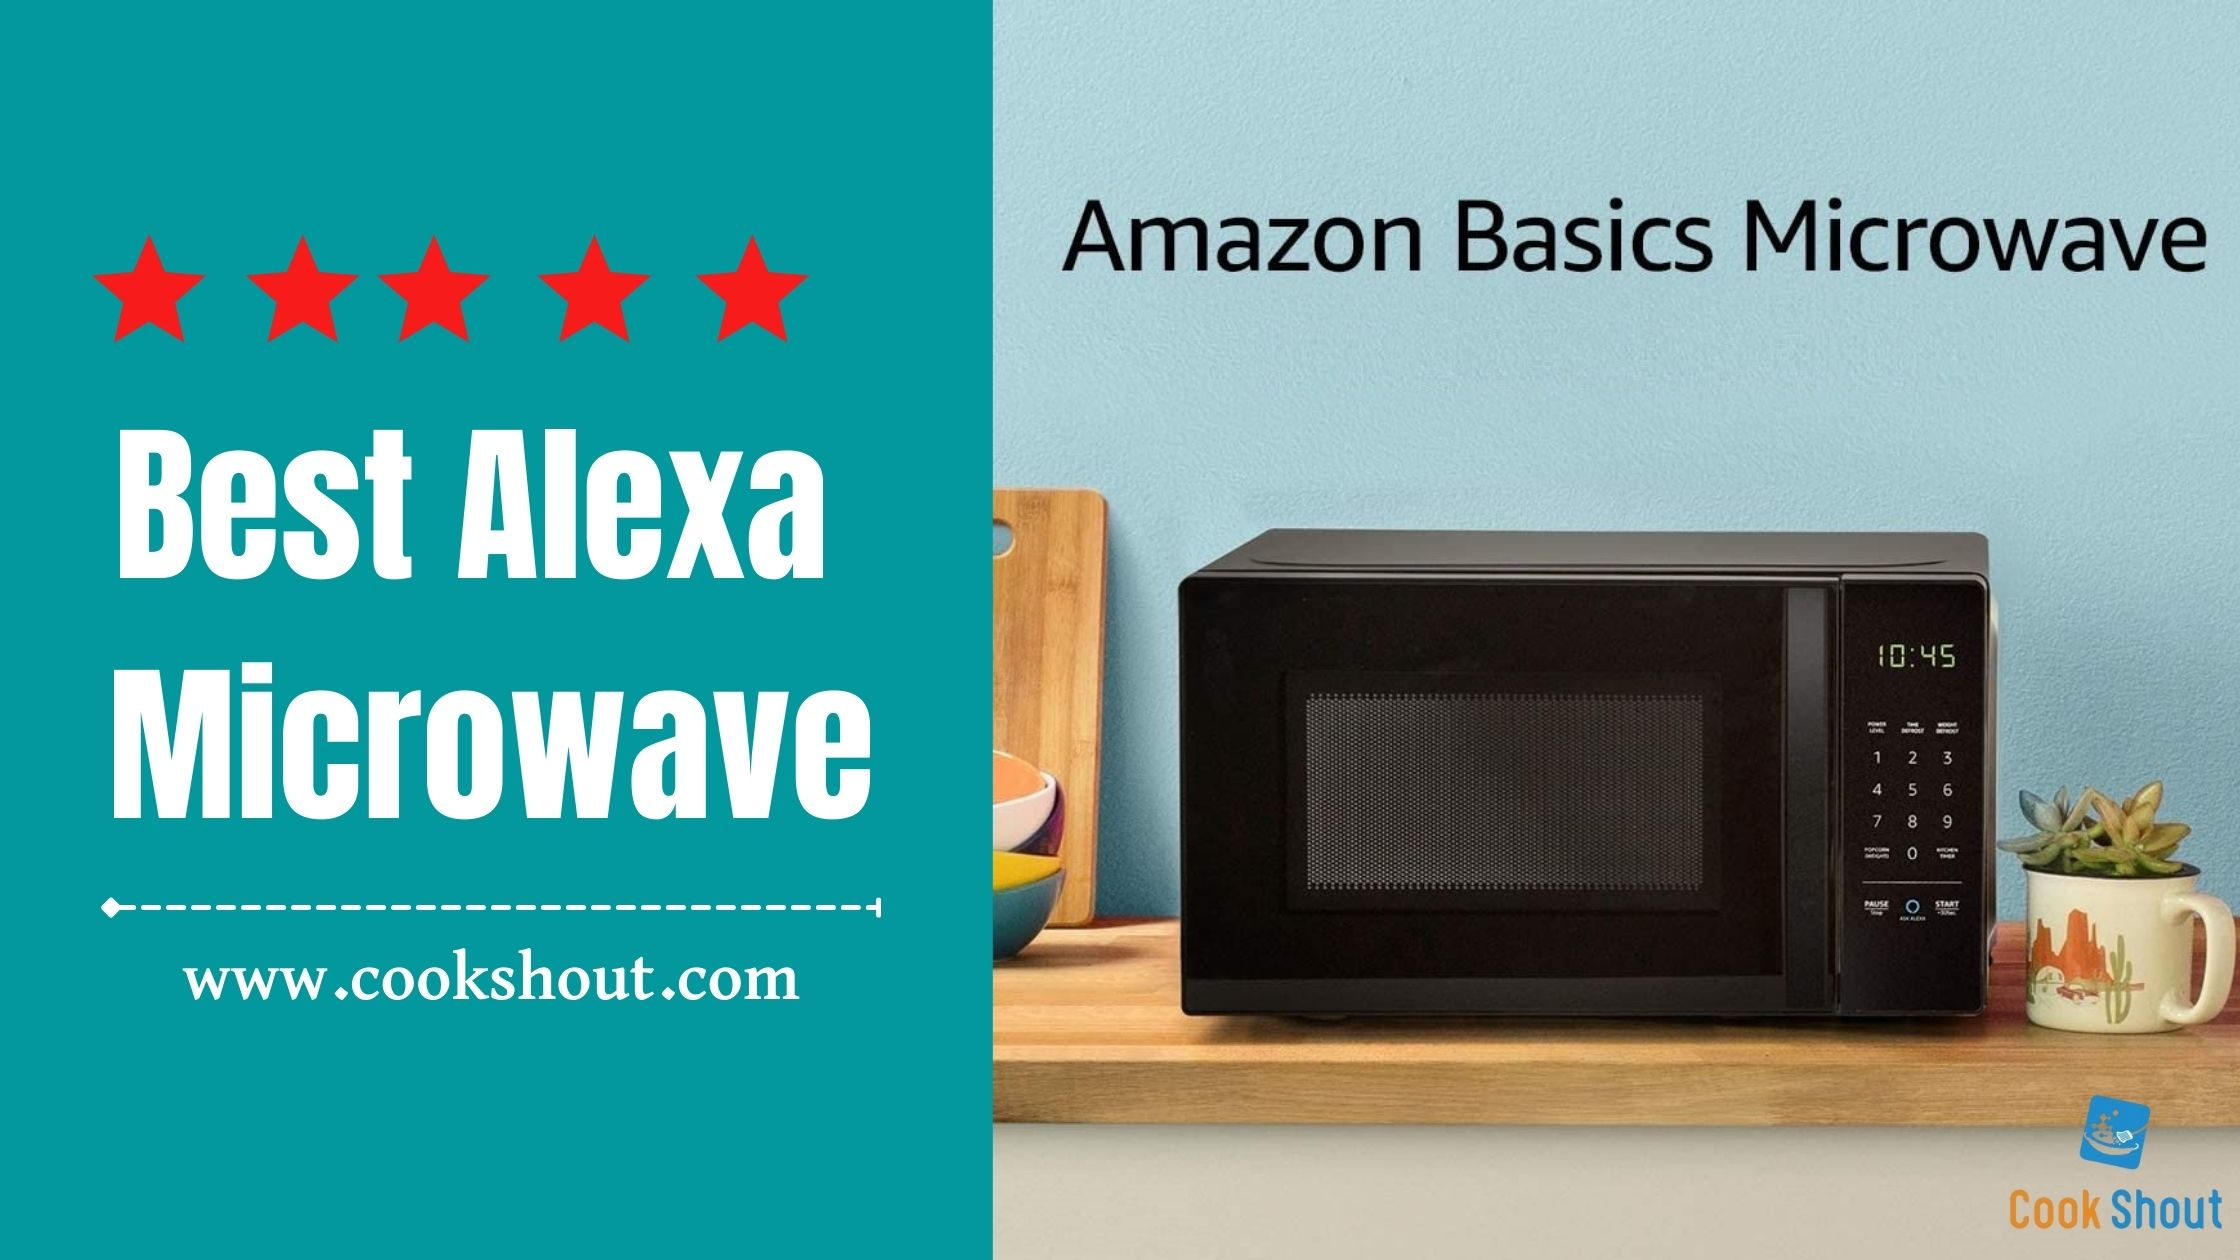 Best Alexa Microwave